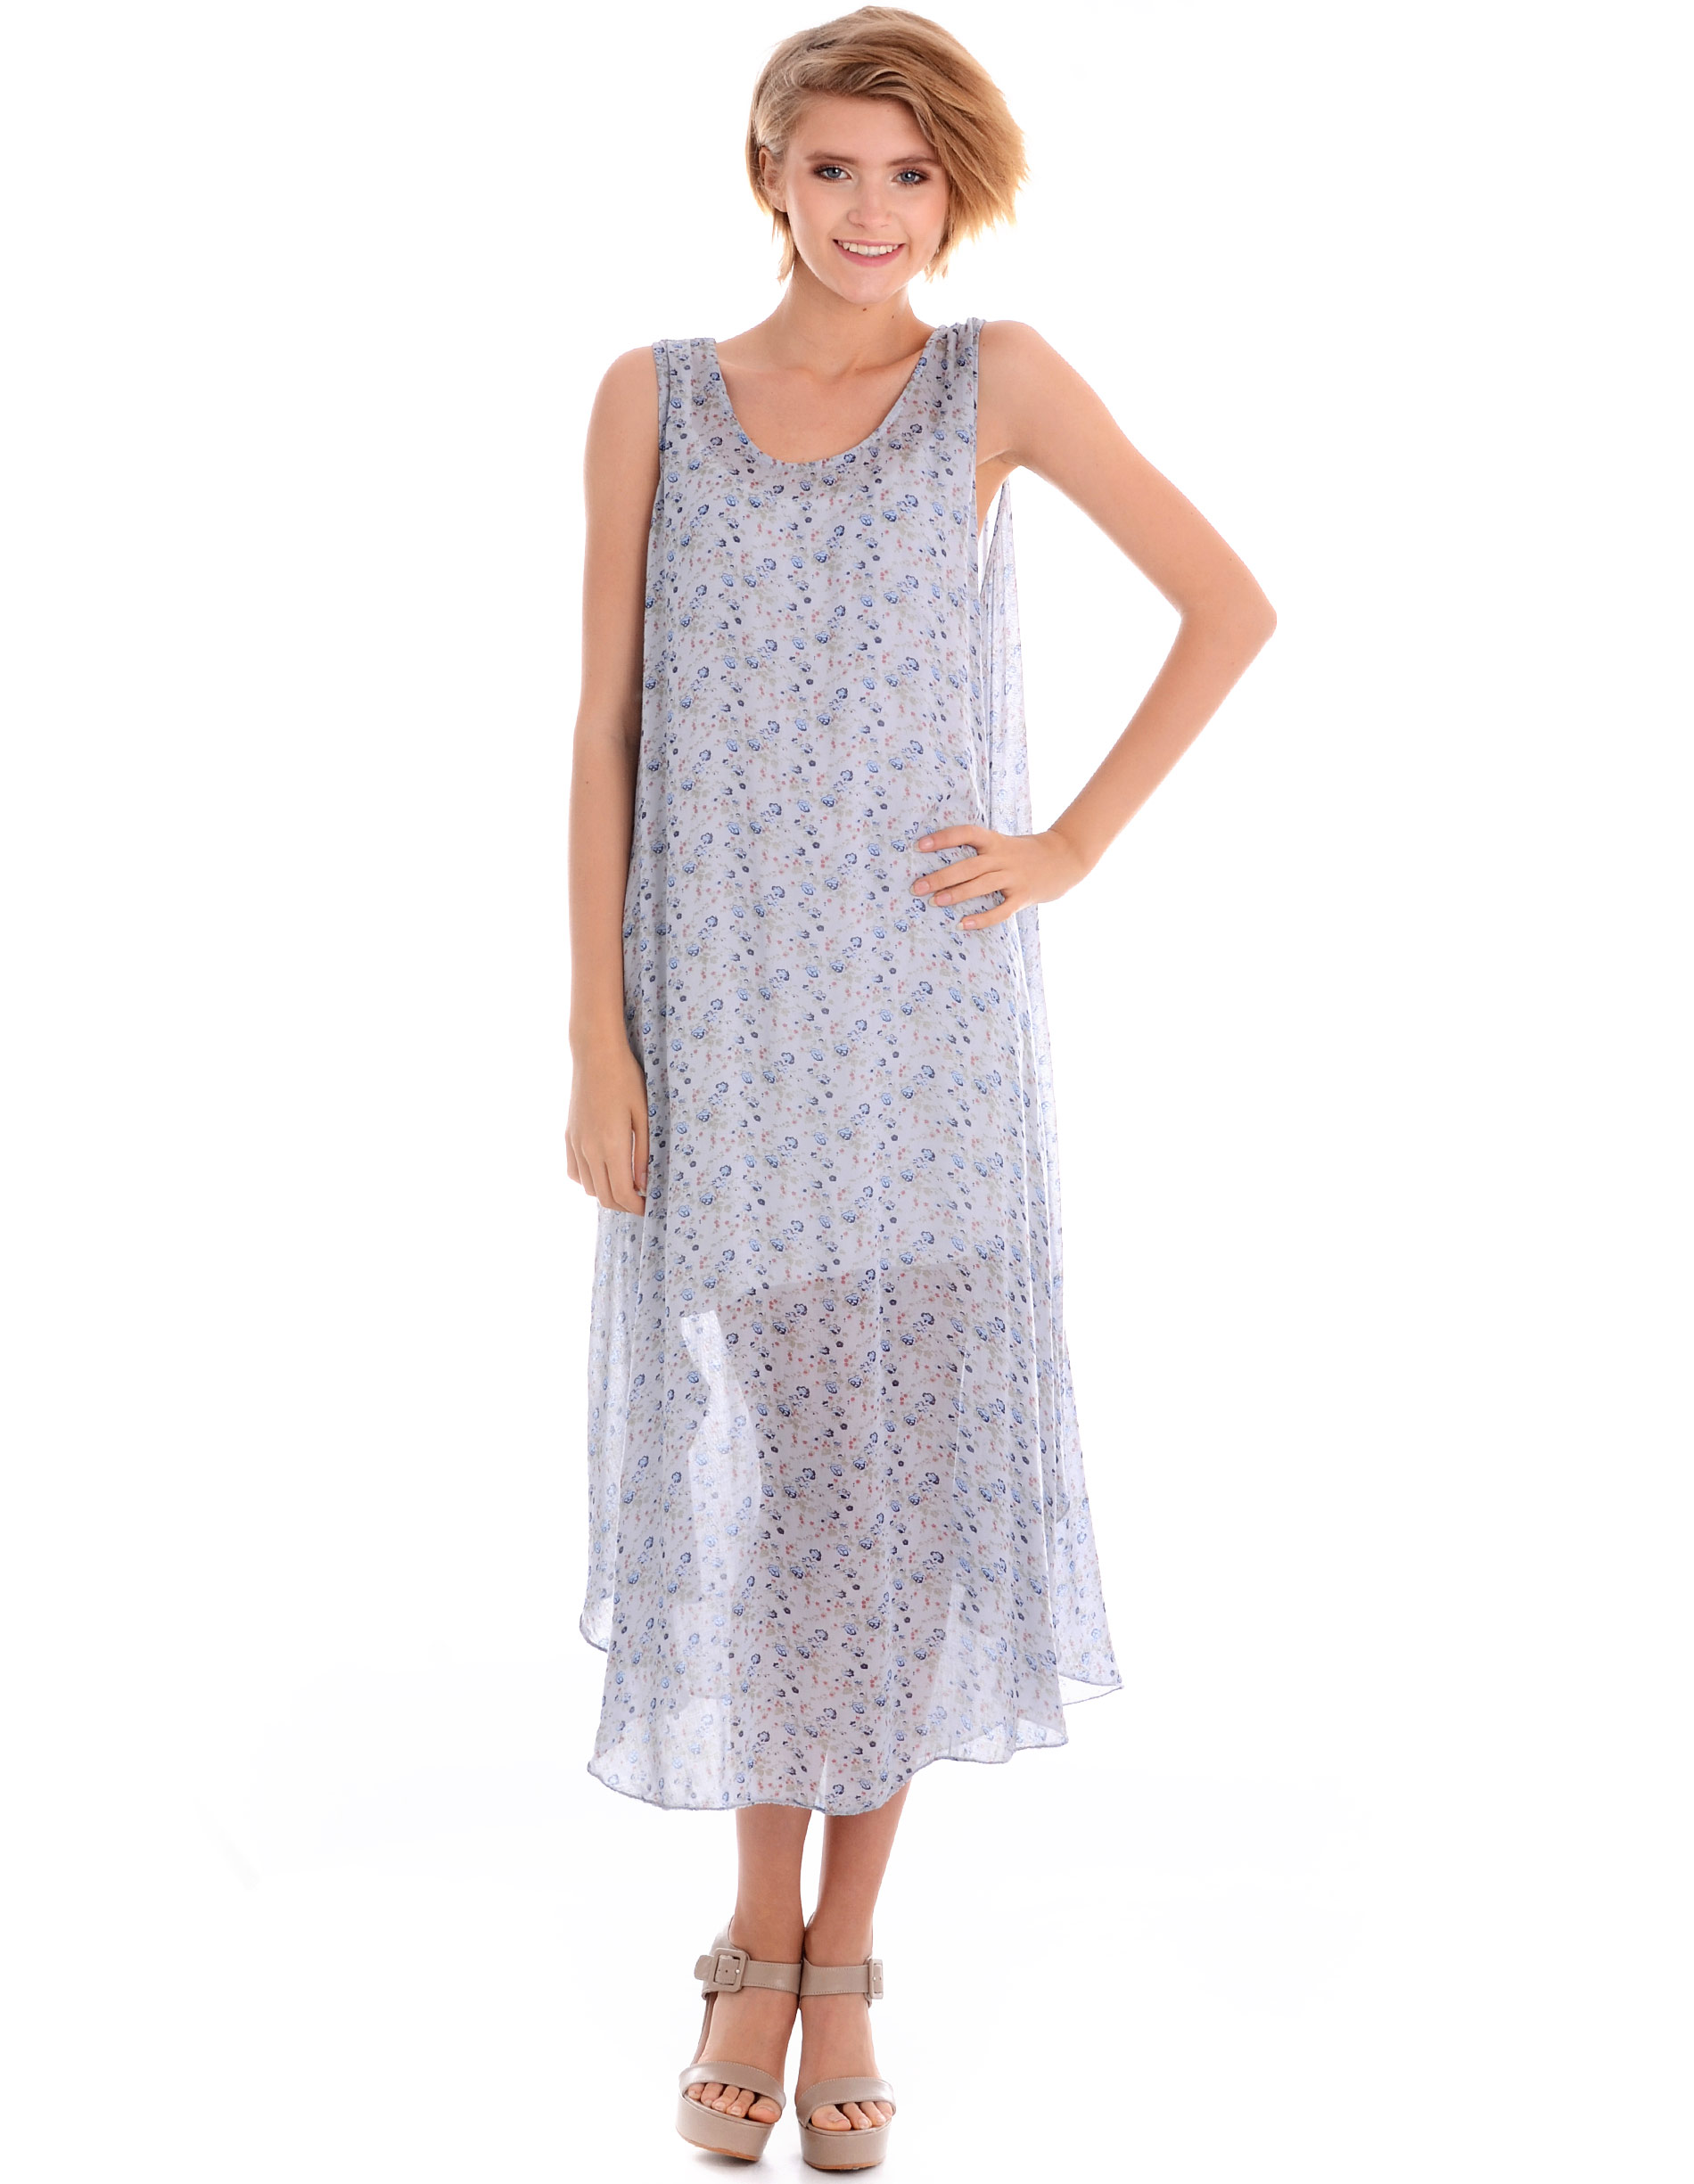 Sukienka - 32-1519Y GRCH - Unisono